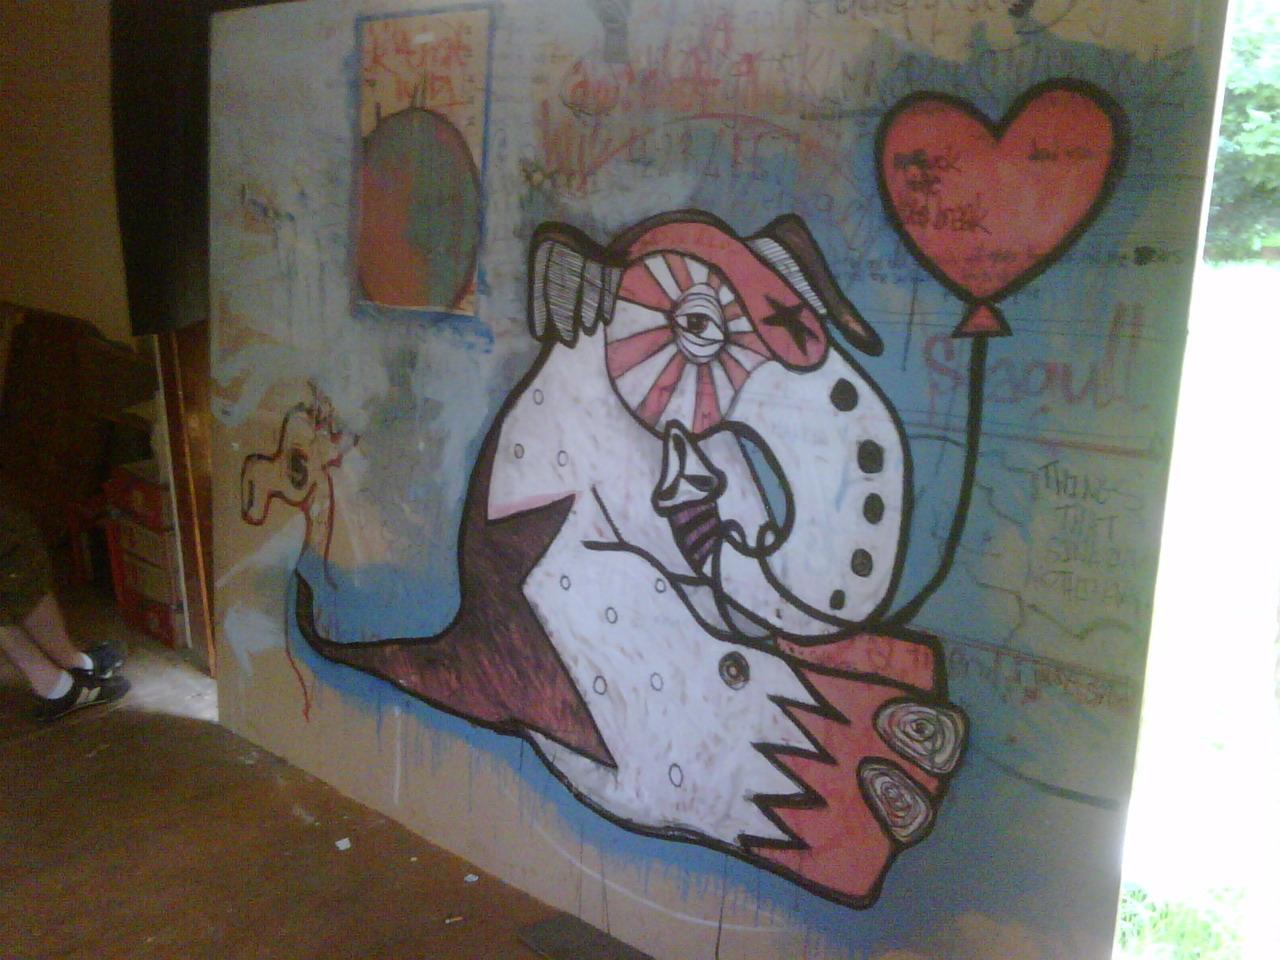 My house mates art